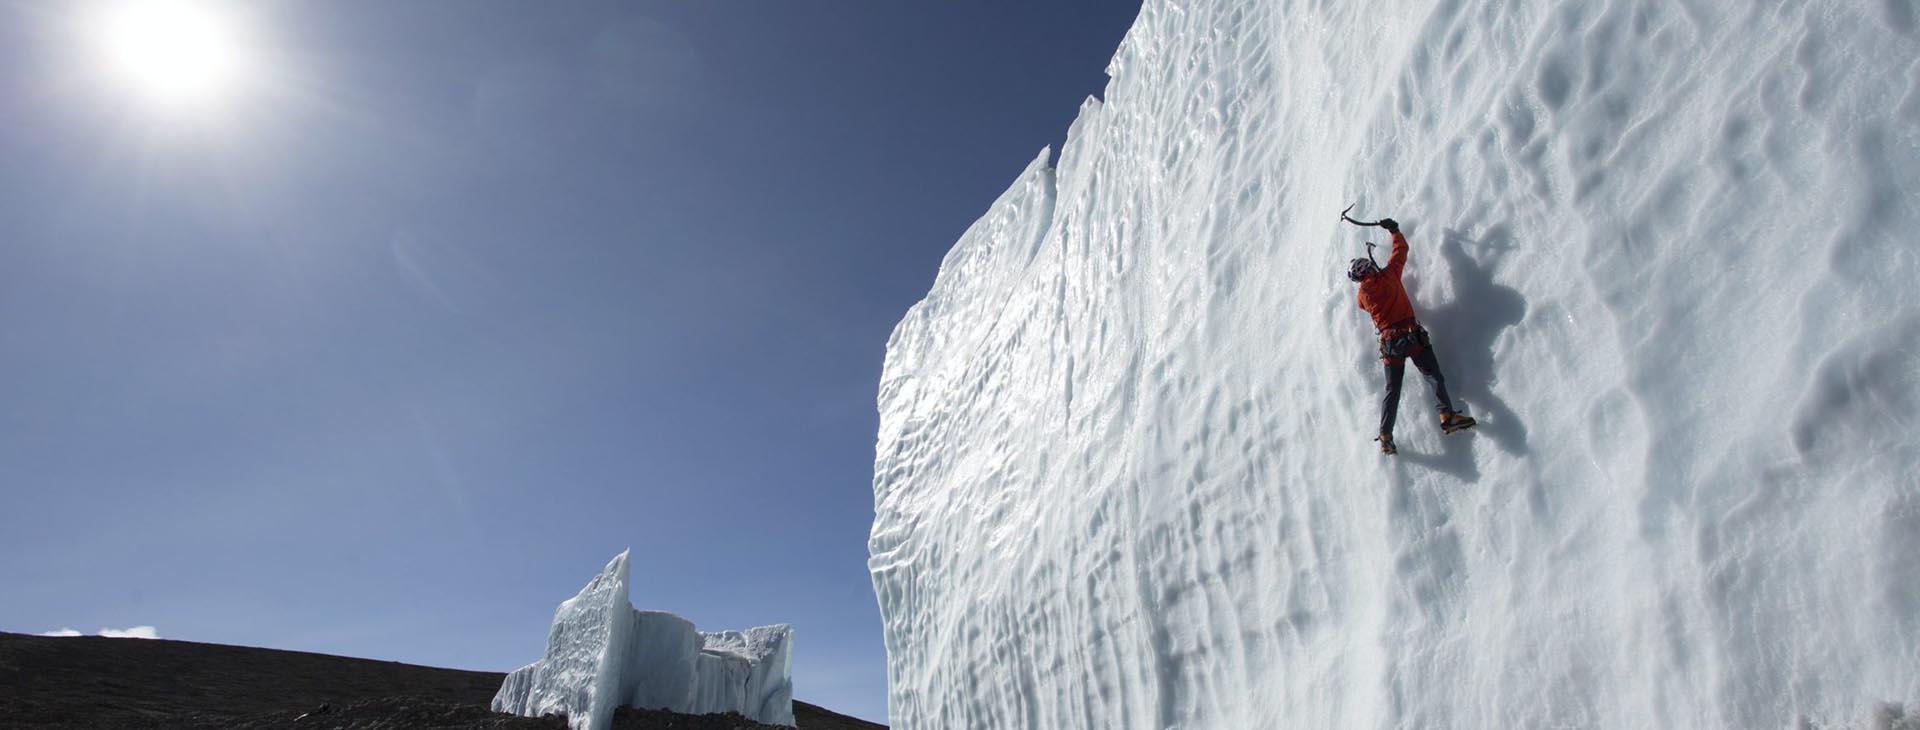 Ice-fall Climbing